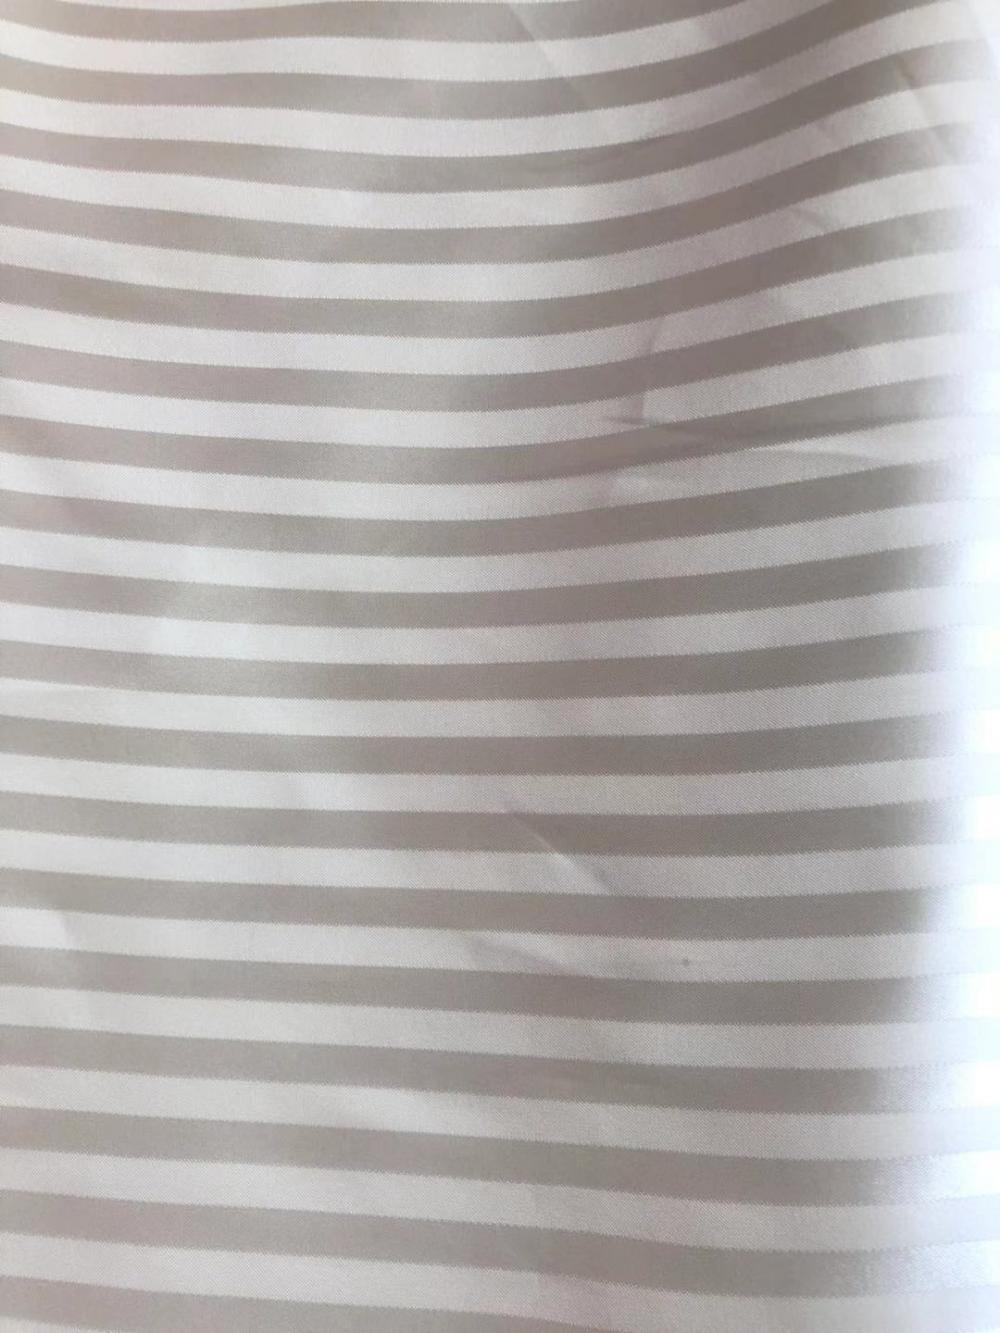 Polyester Jacquar Dobby Fabric